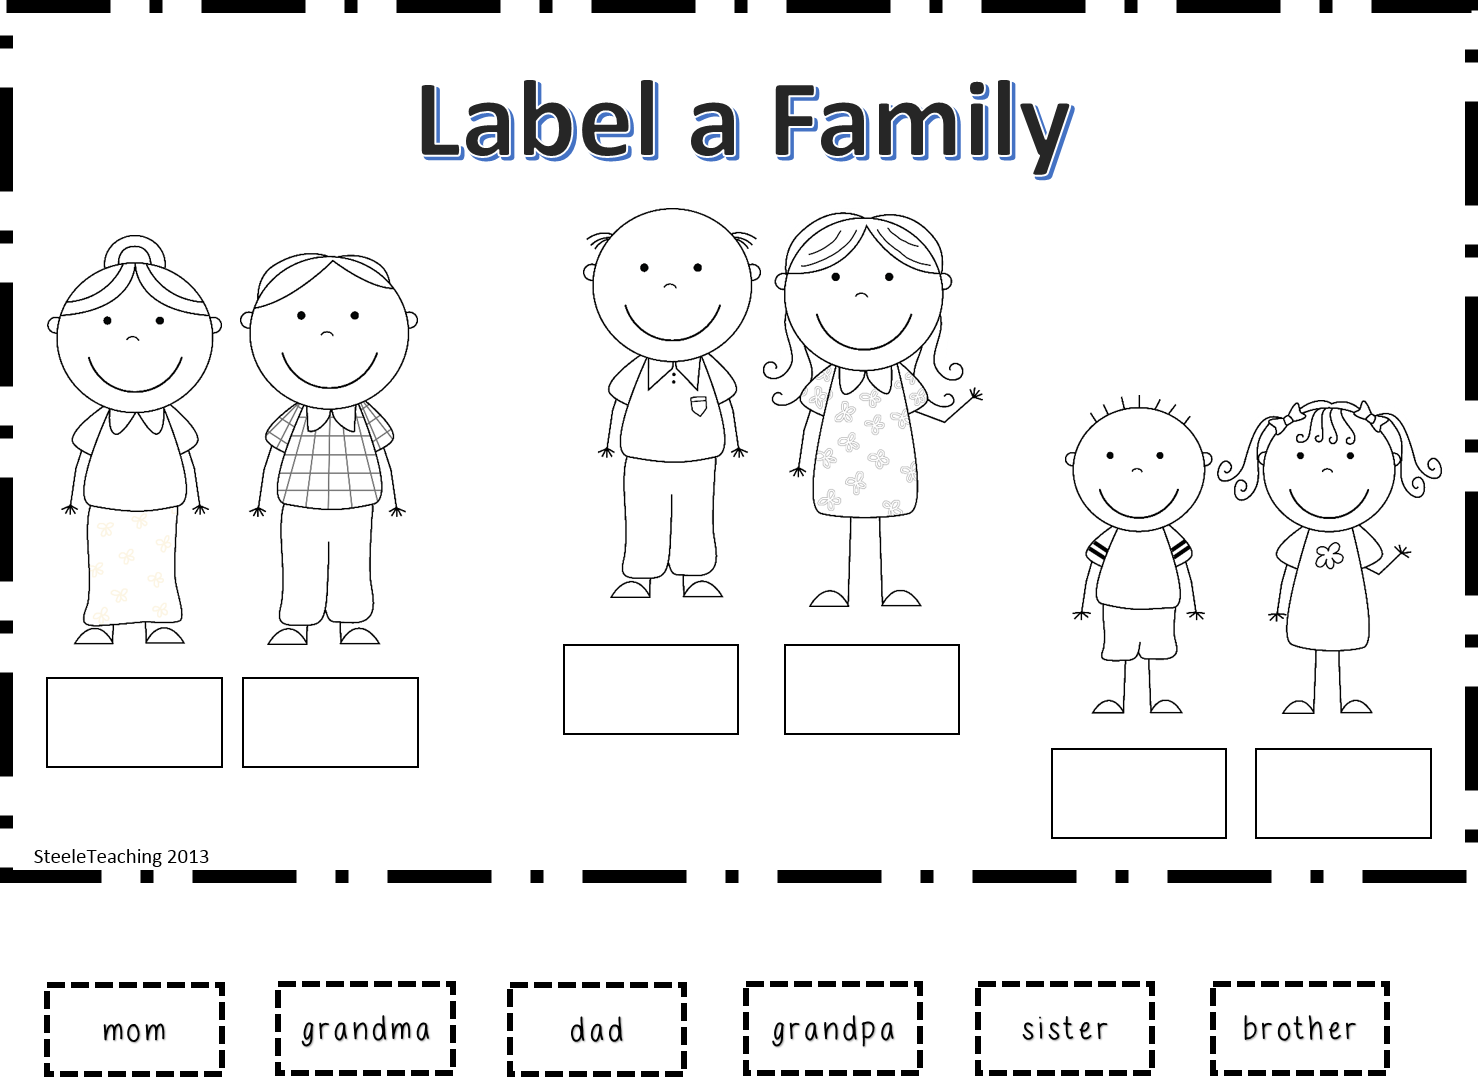 Workbooks it family worksheets : Worksheet For Kindergarten Family: Teaching word families. Free ...